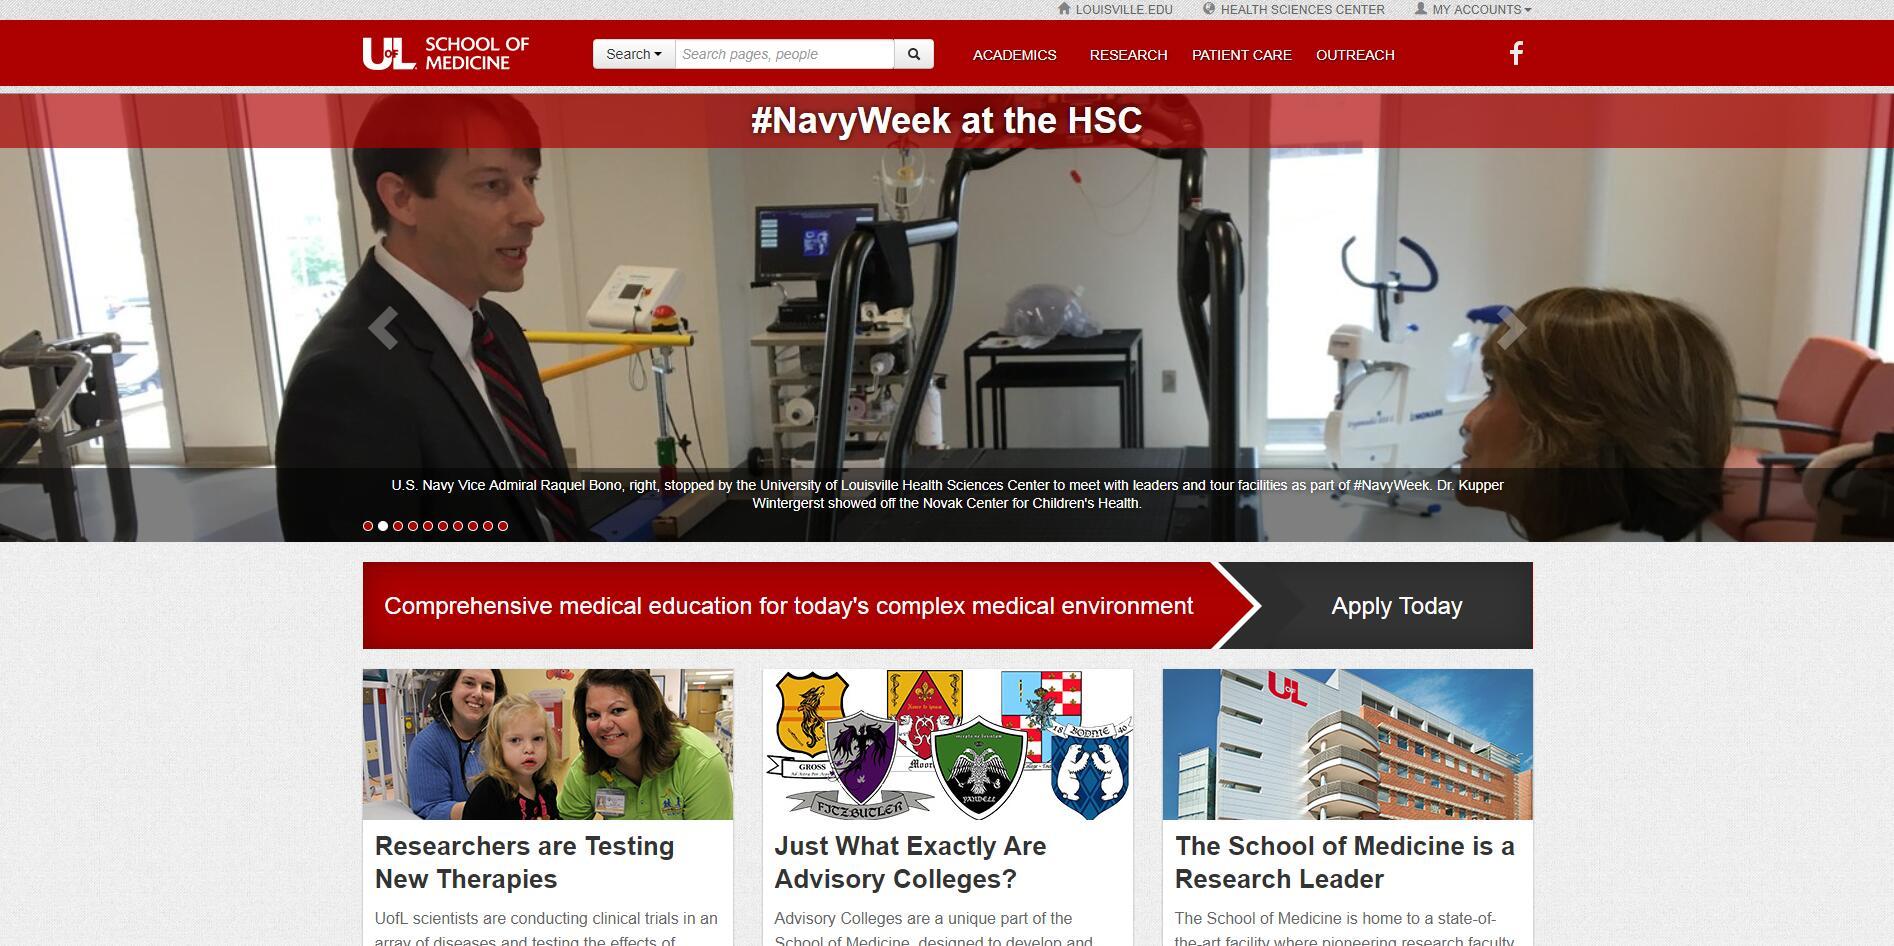 The School of Medicine at University of Louisville